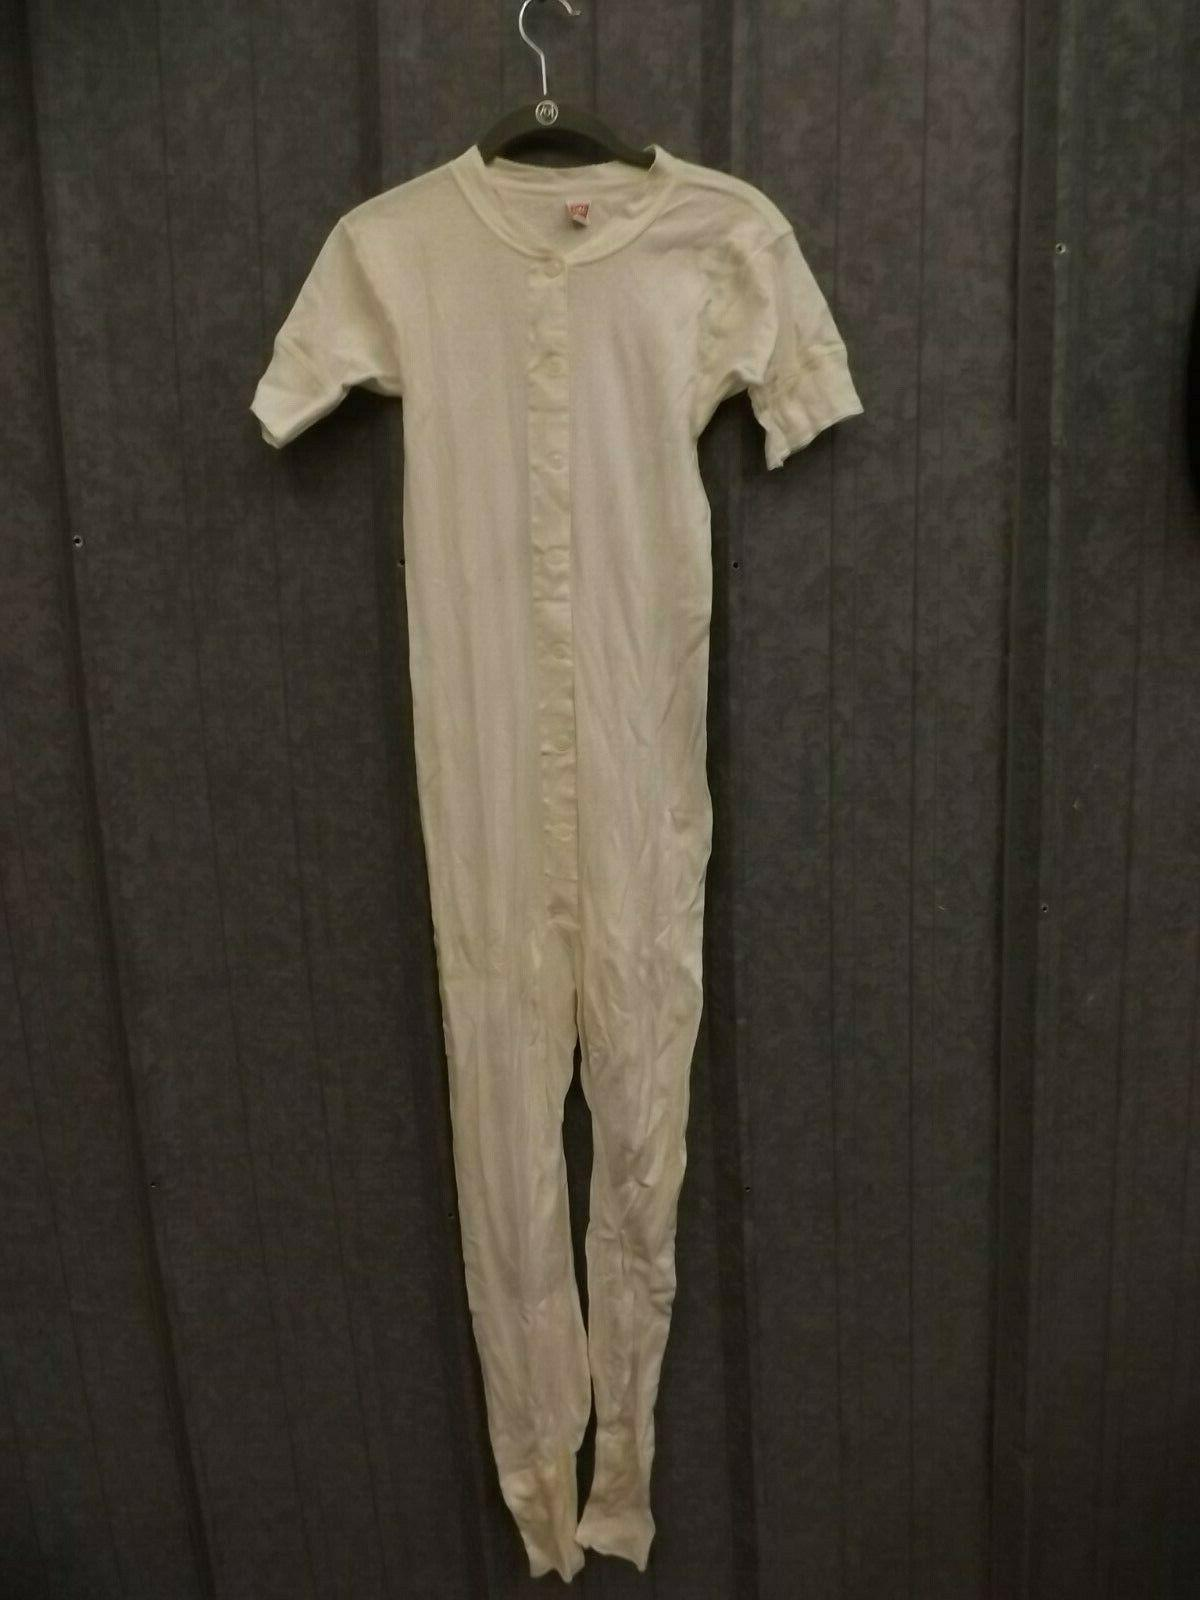 vtg new 1950s white combed cotton short